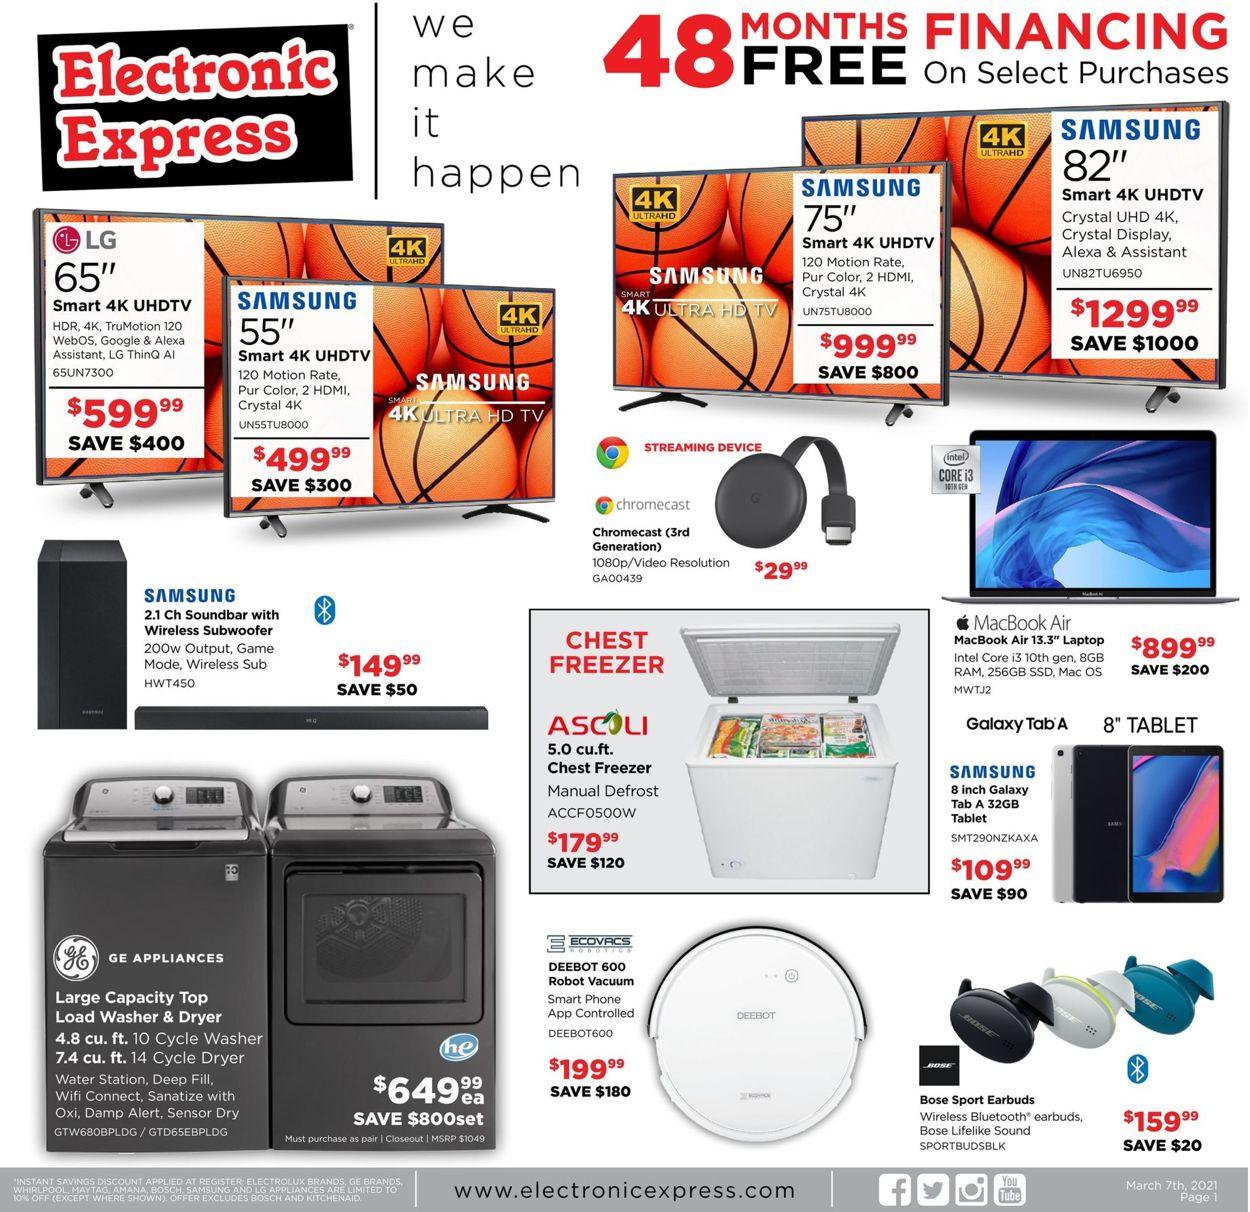 Electronic Express Weekly Ad Circular - valid 03/07-03/13/2021